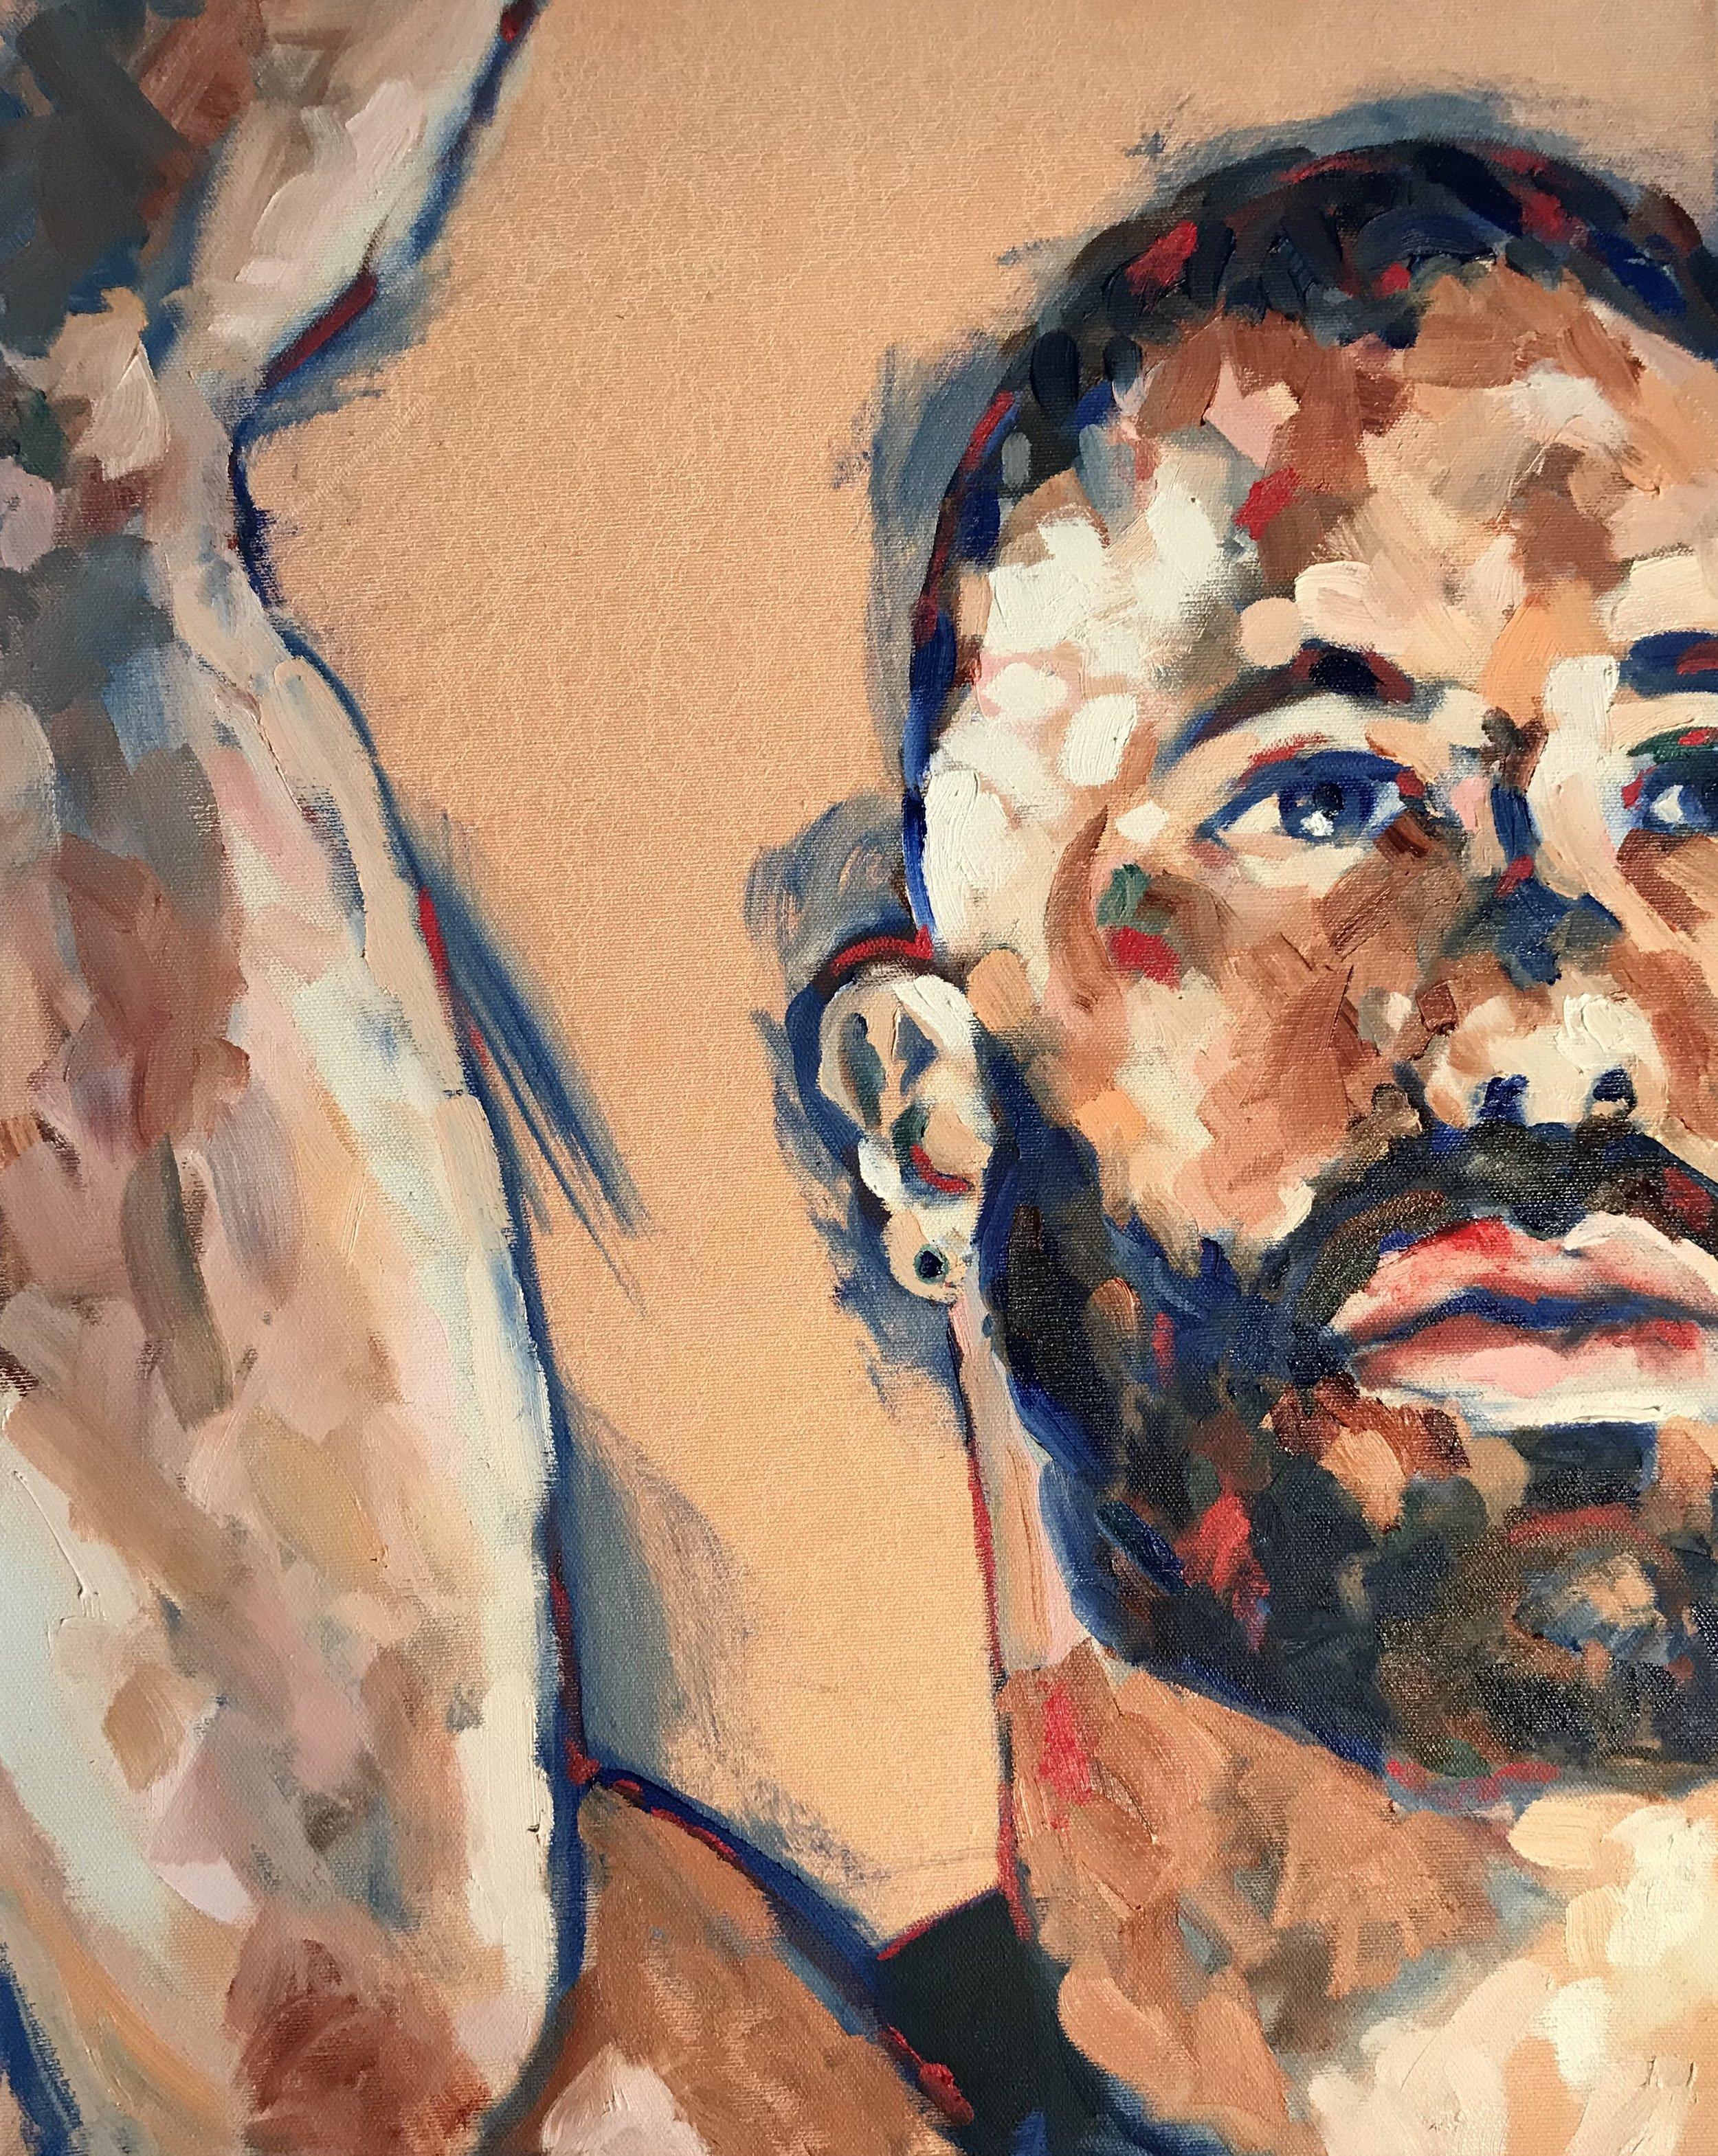 Simon 2 16x20 Oil On Canvas  $700